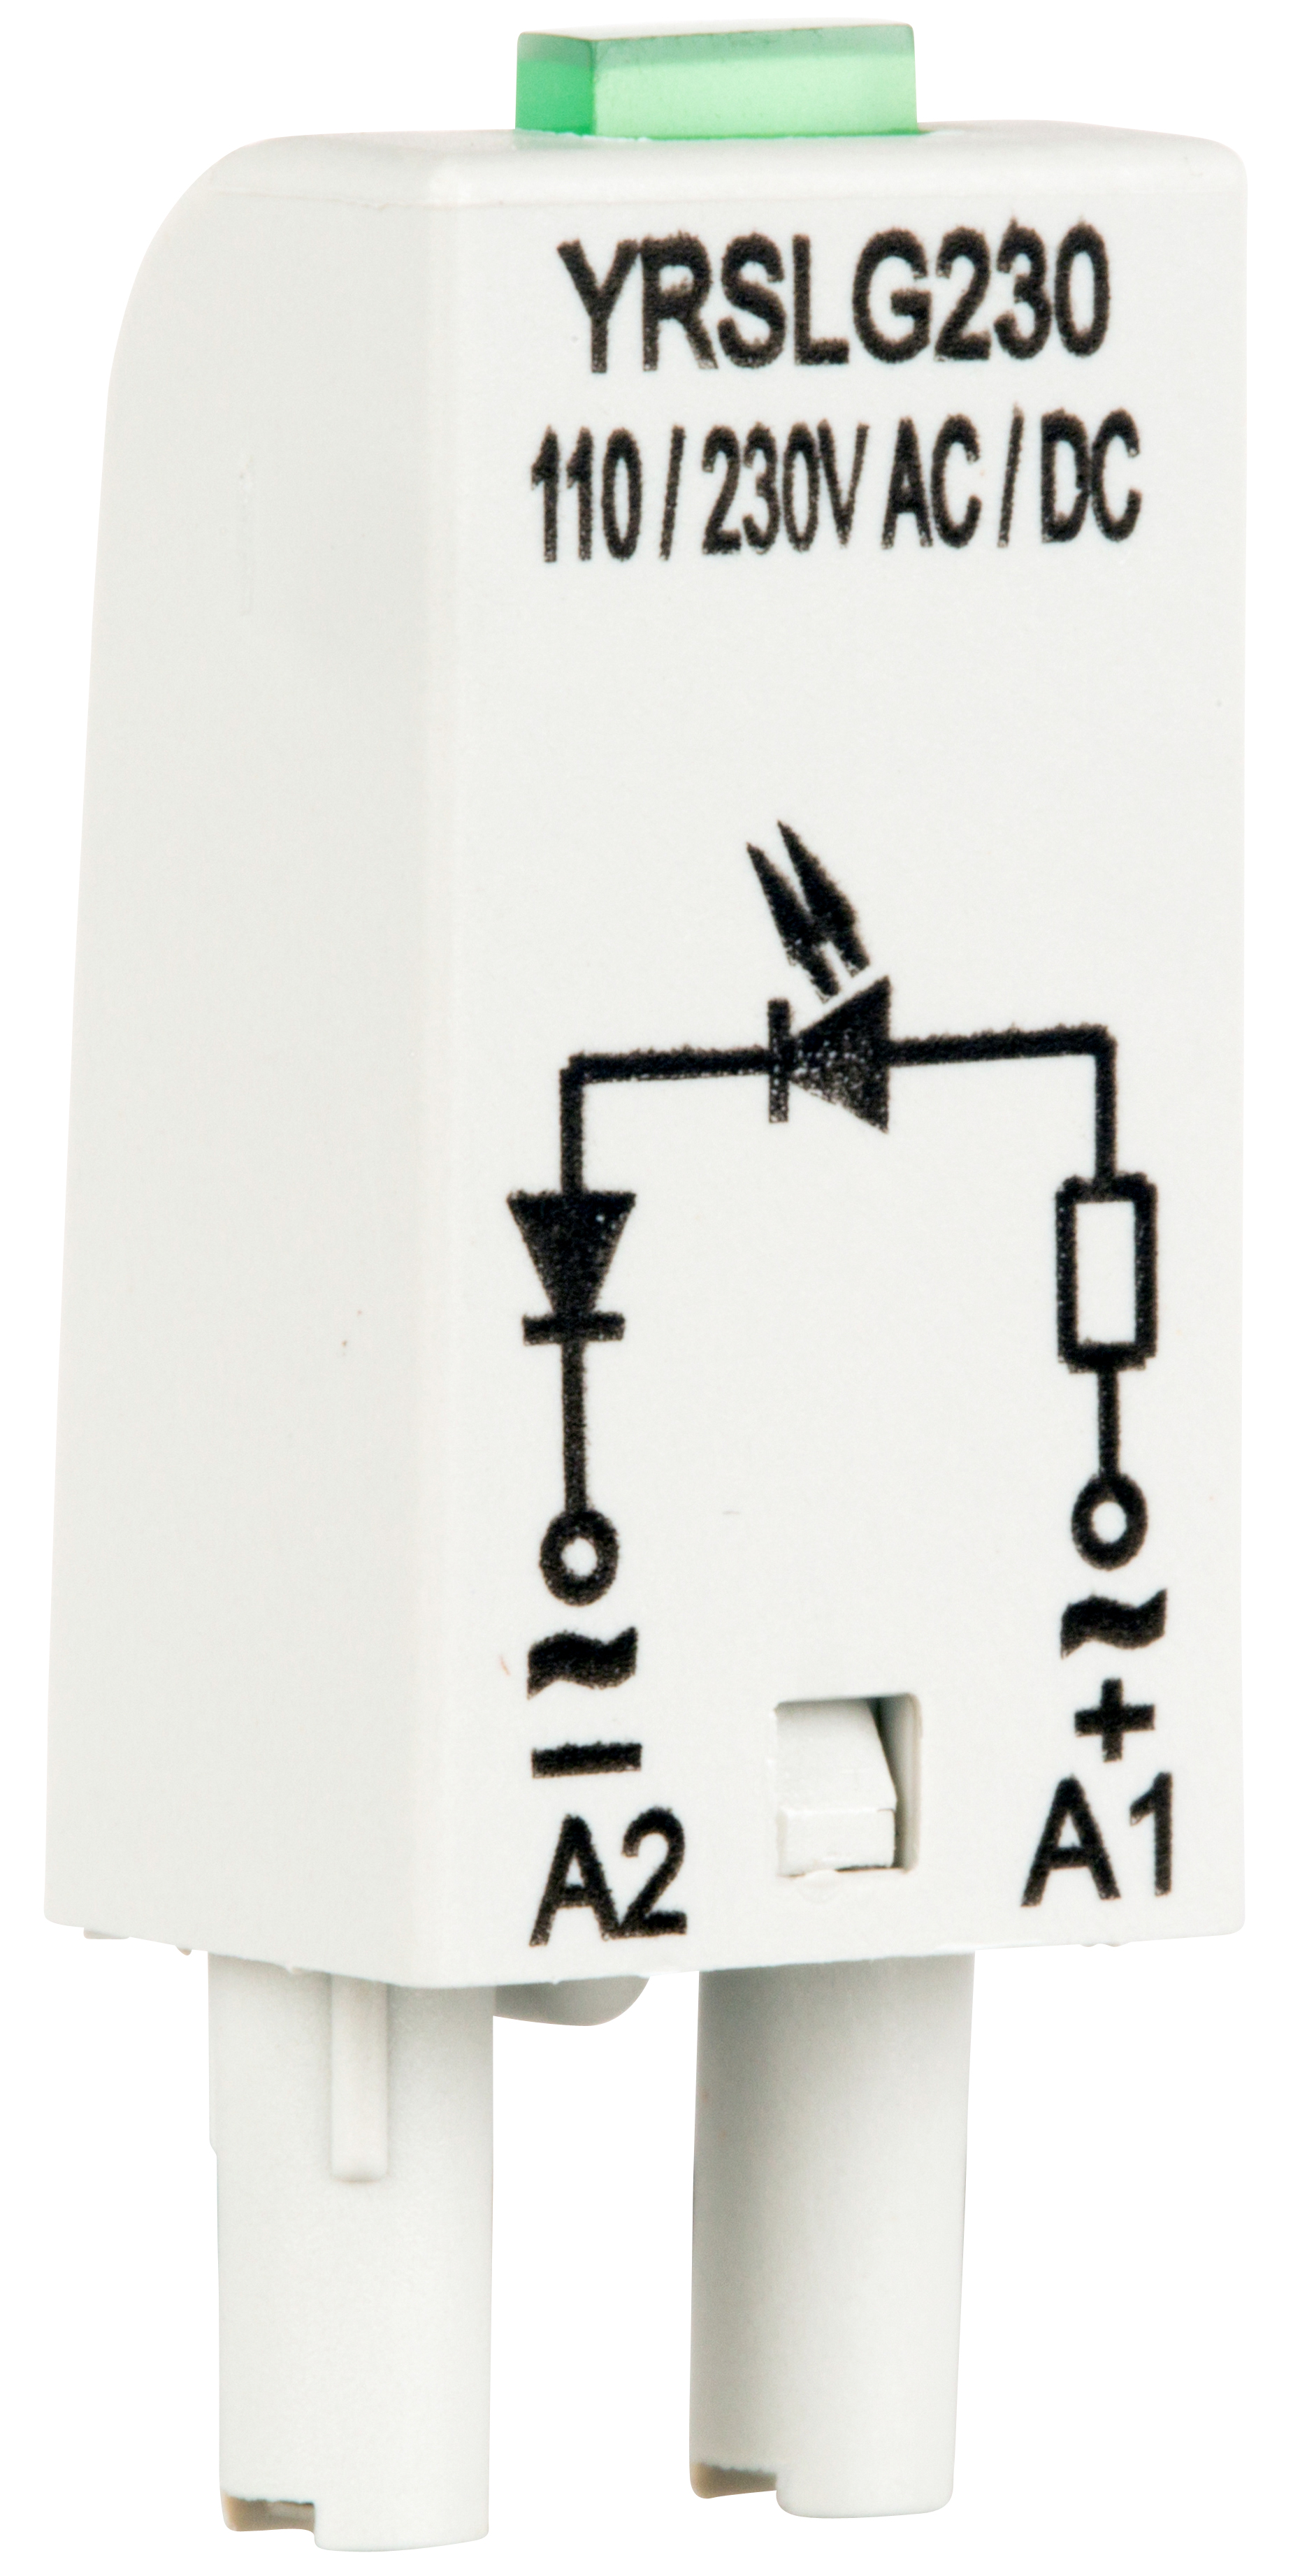 1 Stk LED-Steckmodul, grün, 110-230V AC, S-Relay Serie 4 YRSLG230--